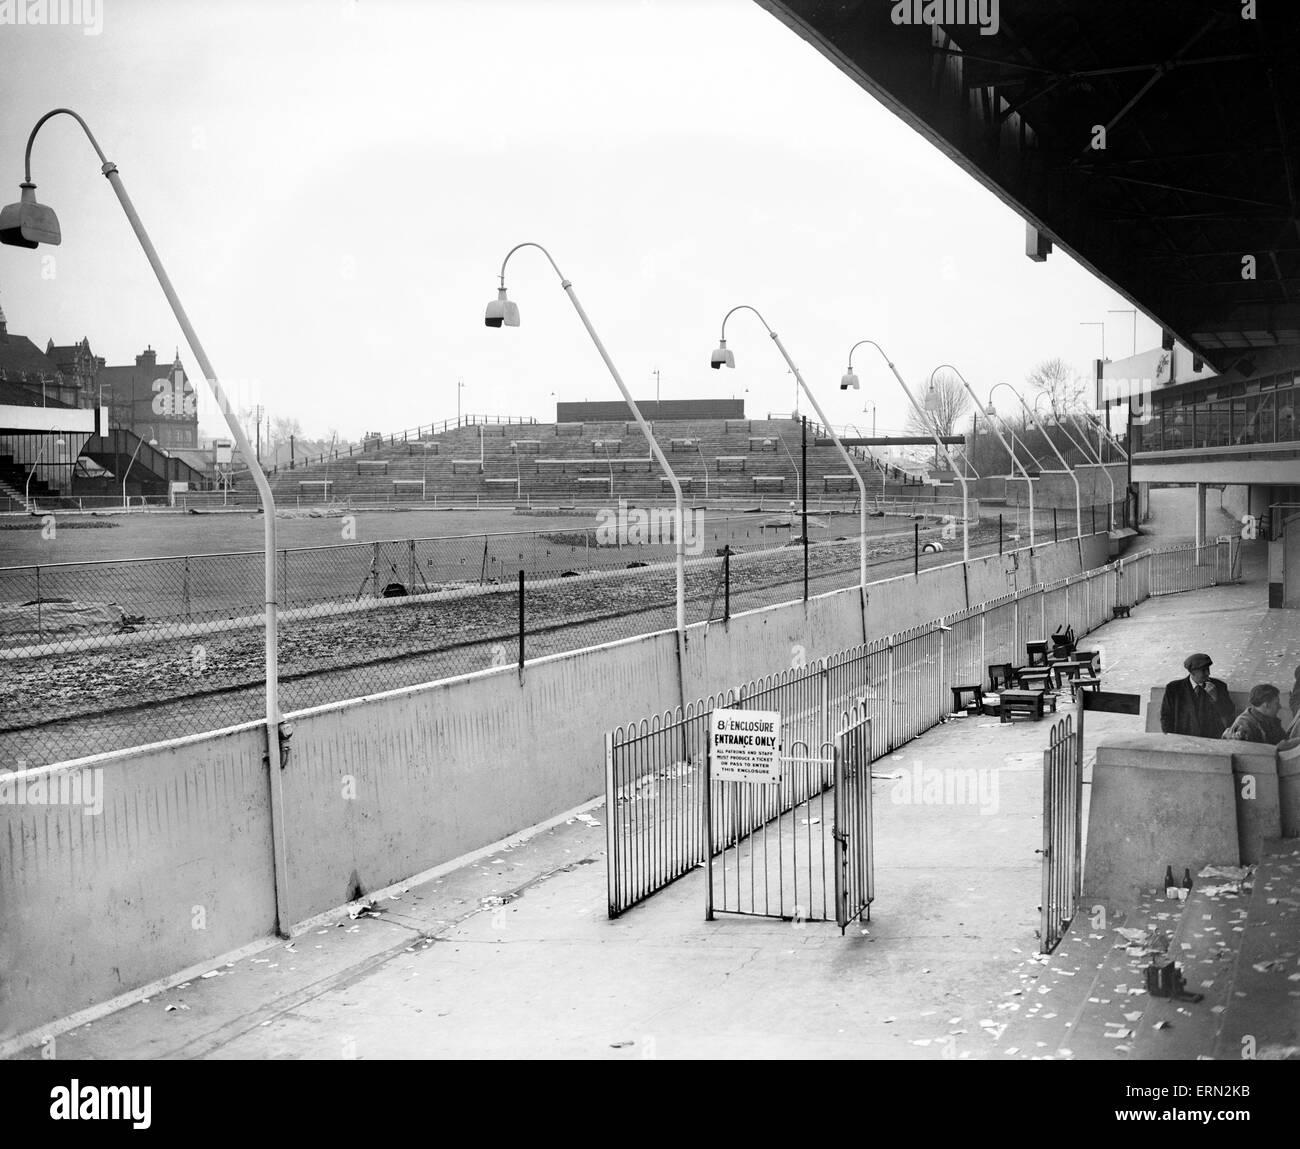 Catford Stadium, 12th February 1950. - Stock Image